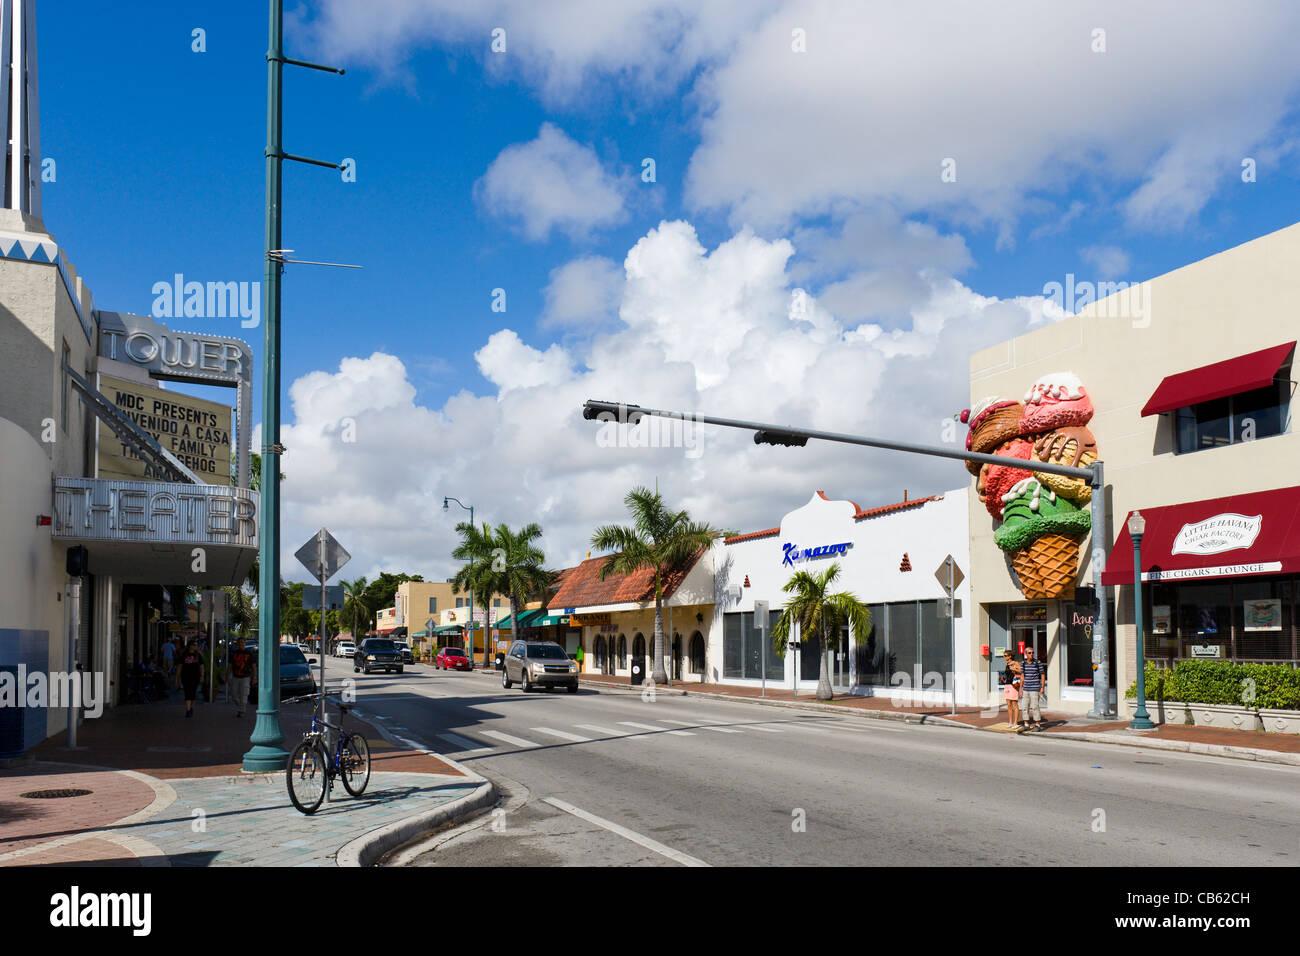 Calle Ocho (SW 8th Street) in Little Havana, Miami, Florida, USA - Stock Image